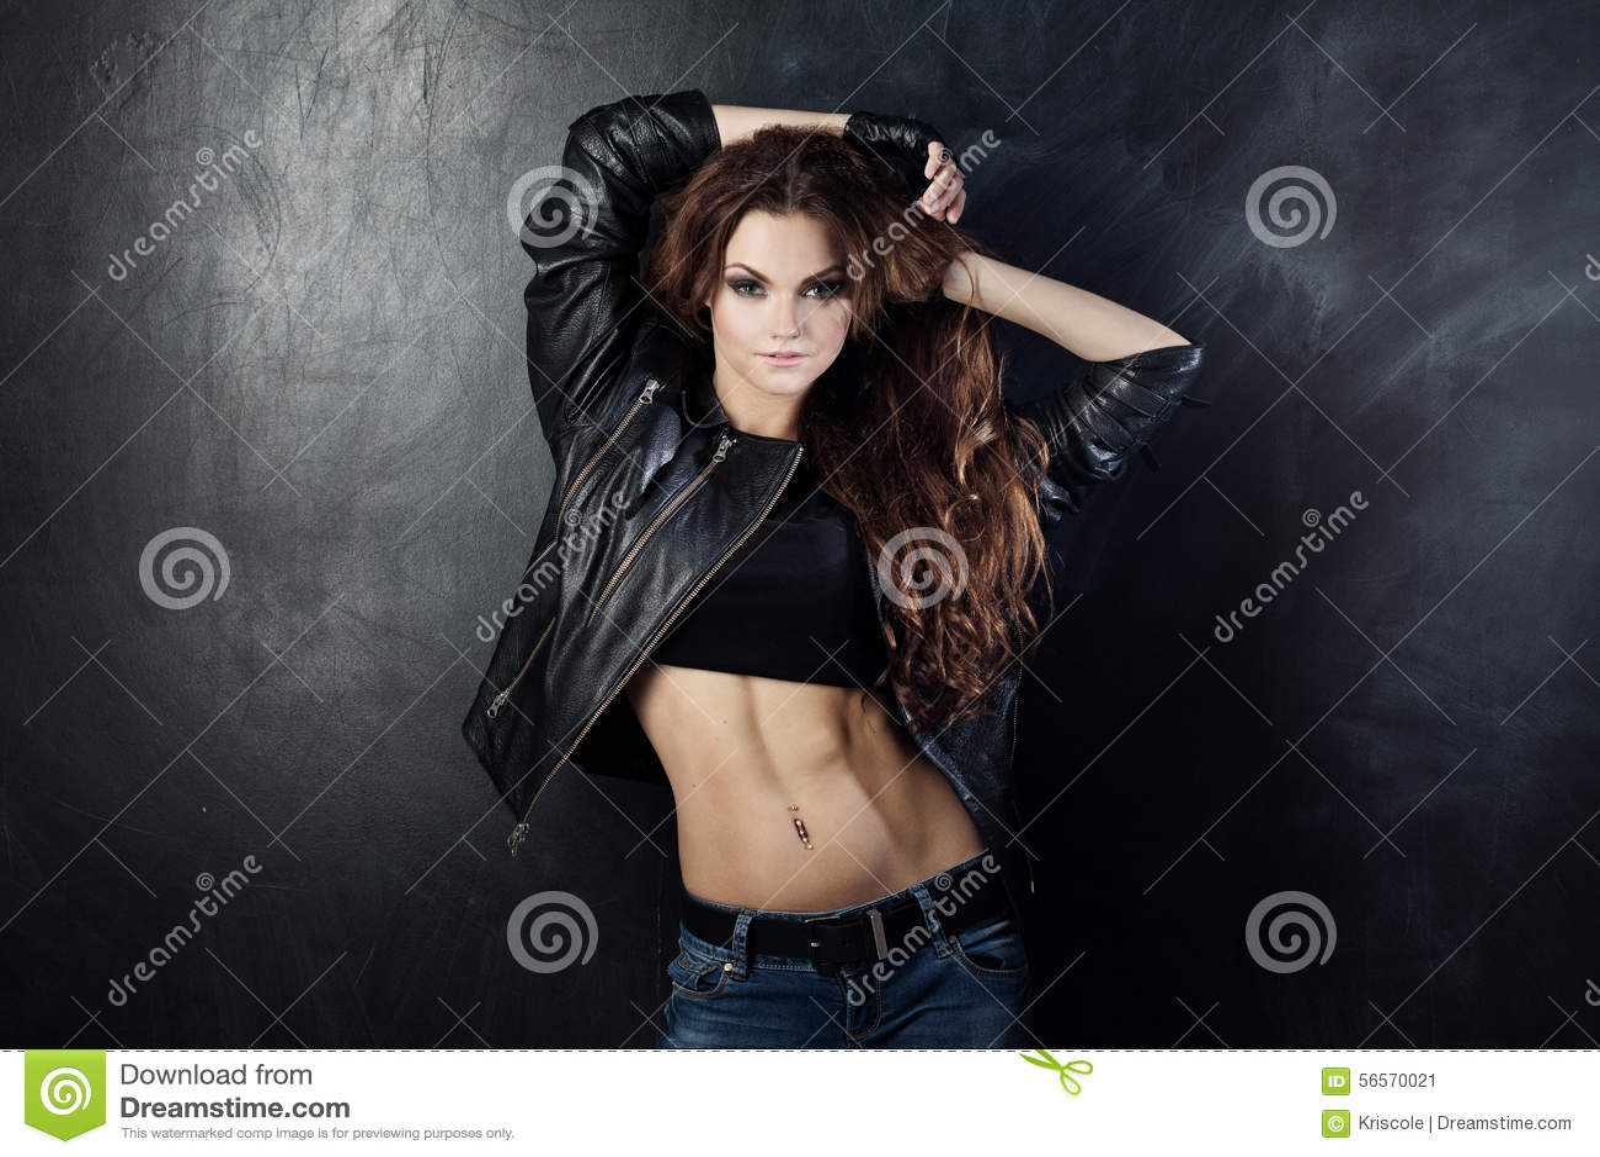 Download Χαμογελώντας νέα γυναίκα που χορεύει, πέταγμα τρίχας Στοκ Εικόνα - εικόνα από λέσχη, ευχαρίστηση: 56570021